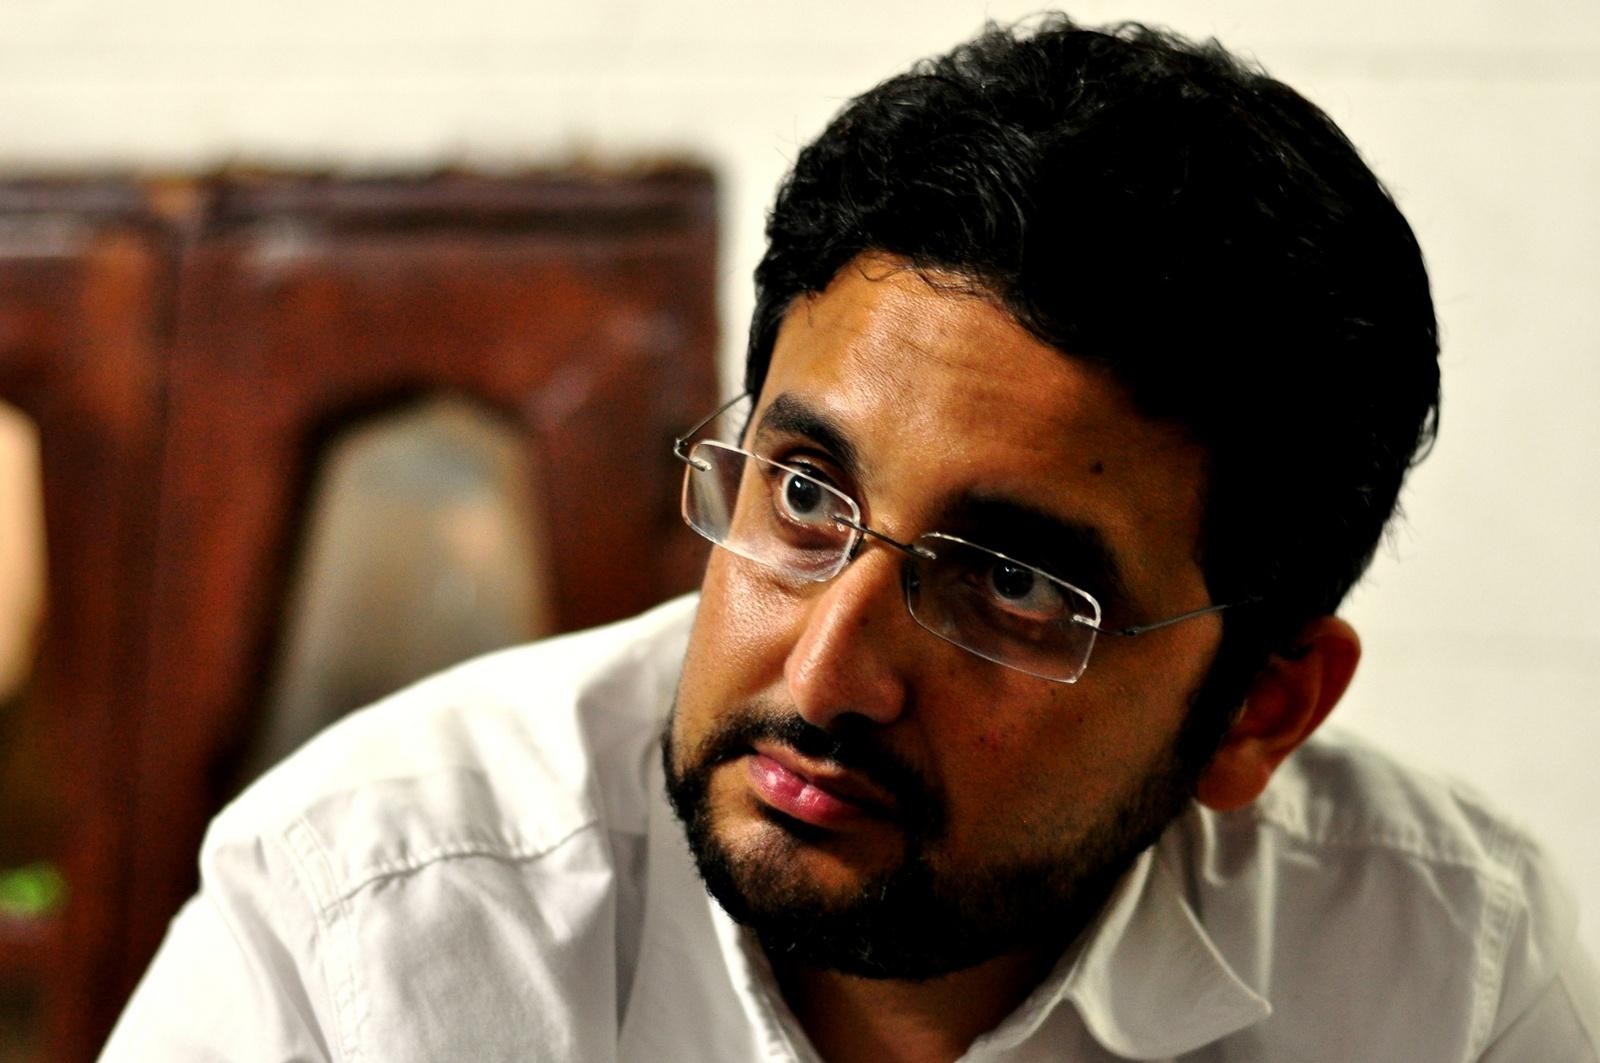 Gehad El Haddad, spokesperson of the Muslim Brotherhood (Photo by Aaron T. Rose/DNE)